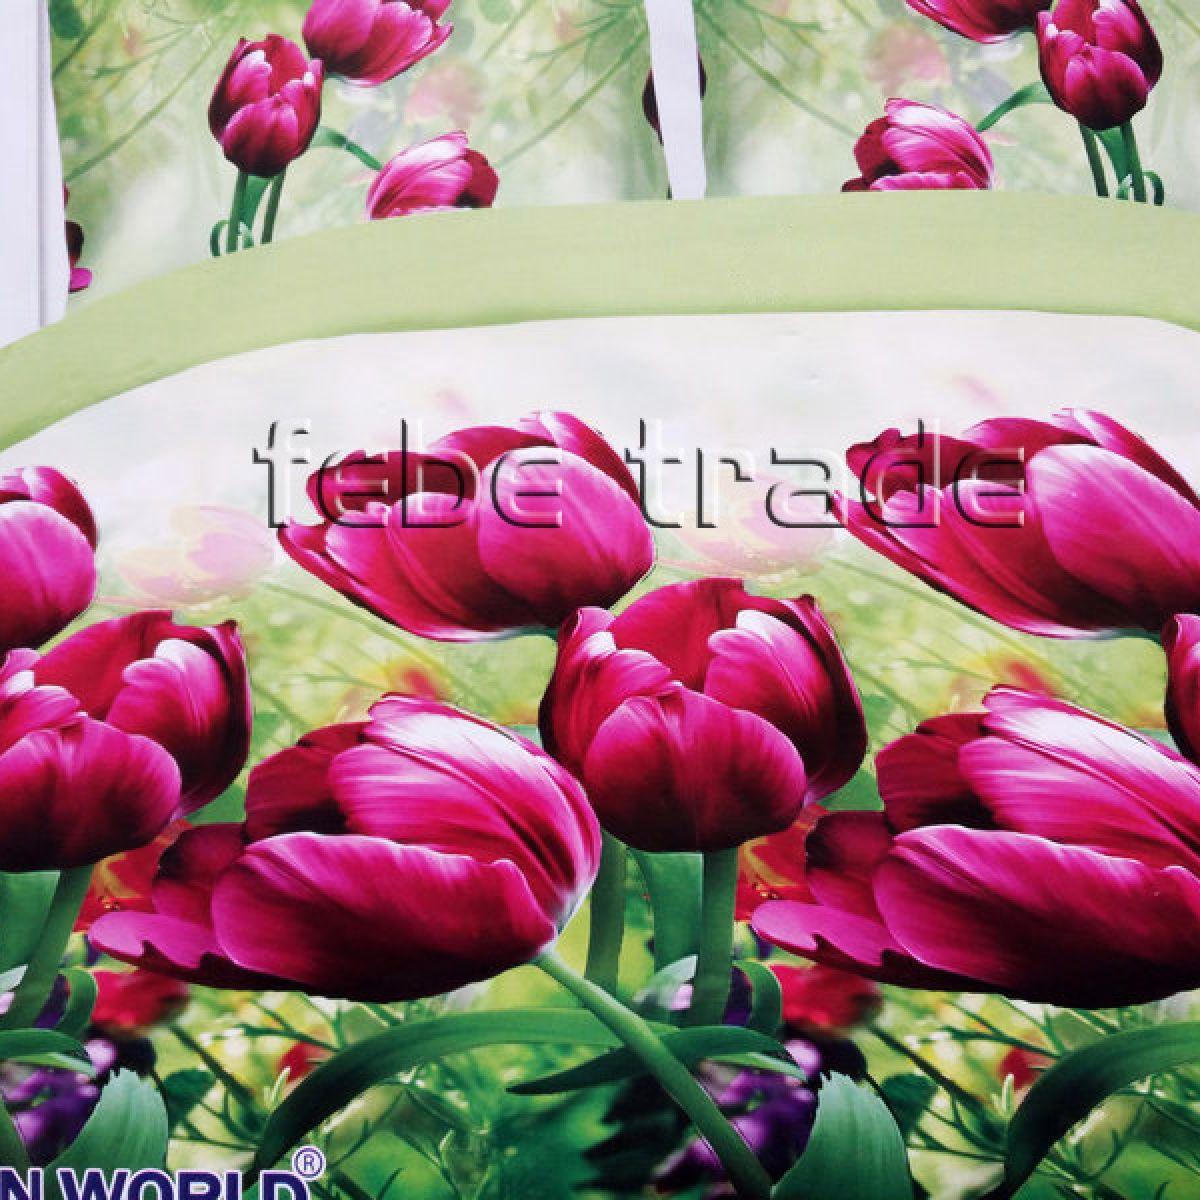 3D Beddings - Cotton World - FSB-406 - 180x200 cm - 4 pcs